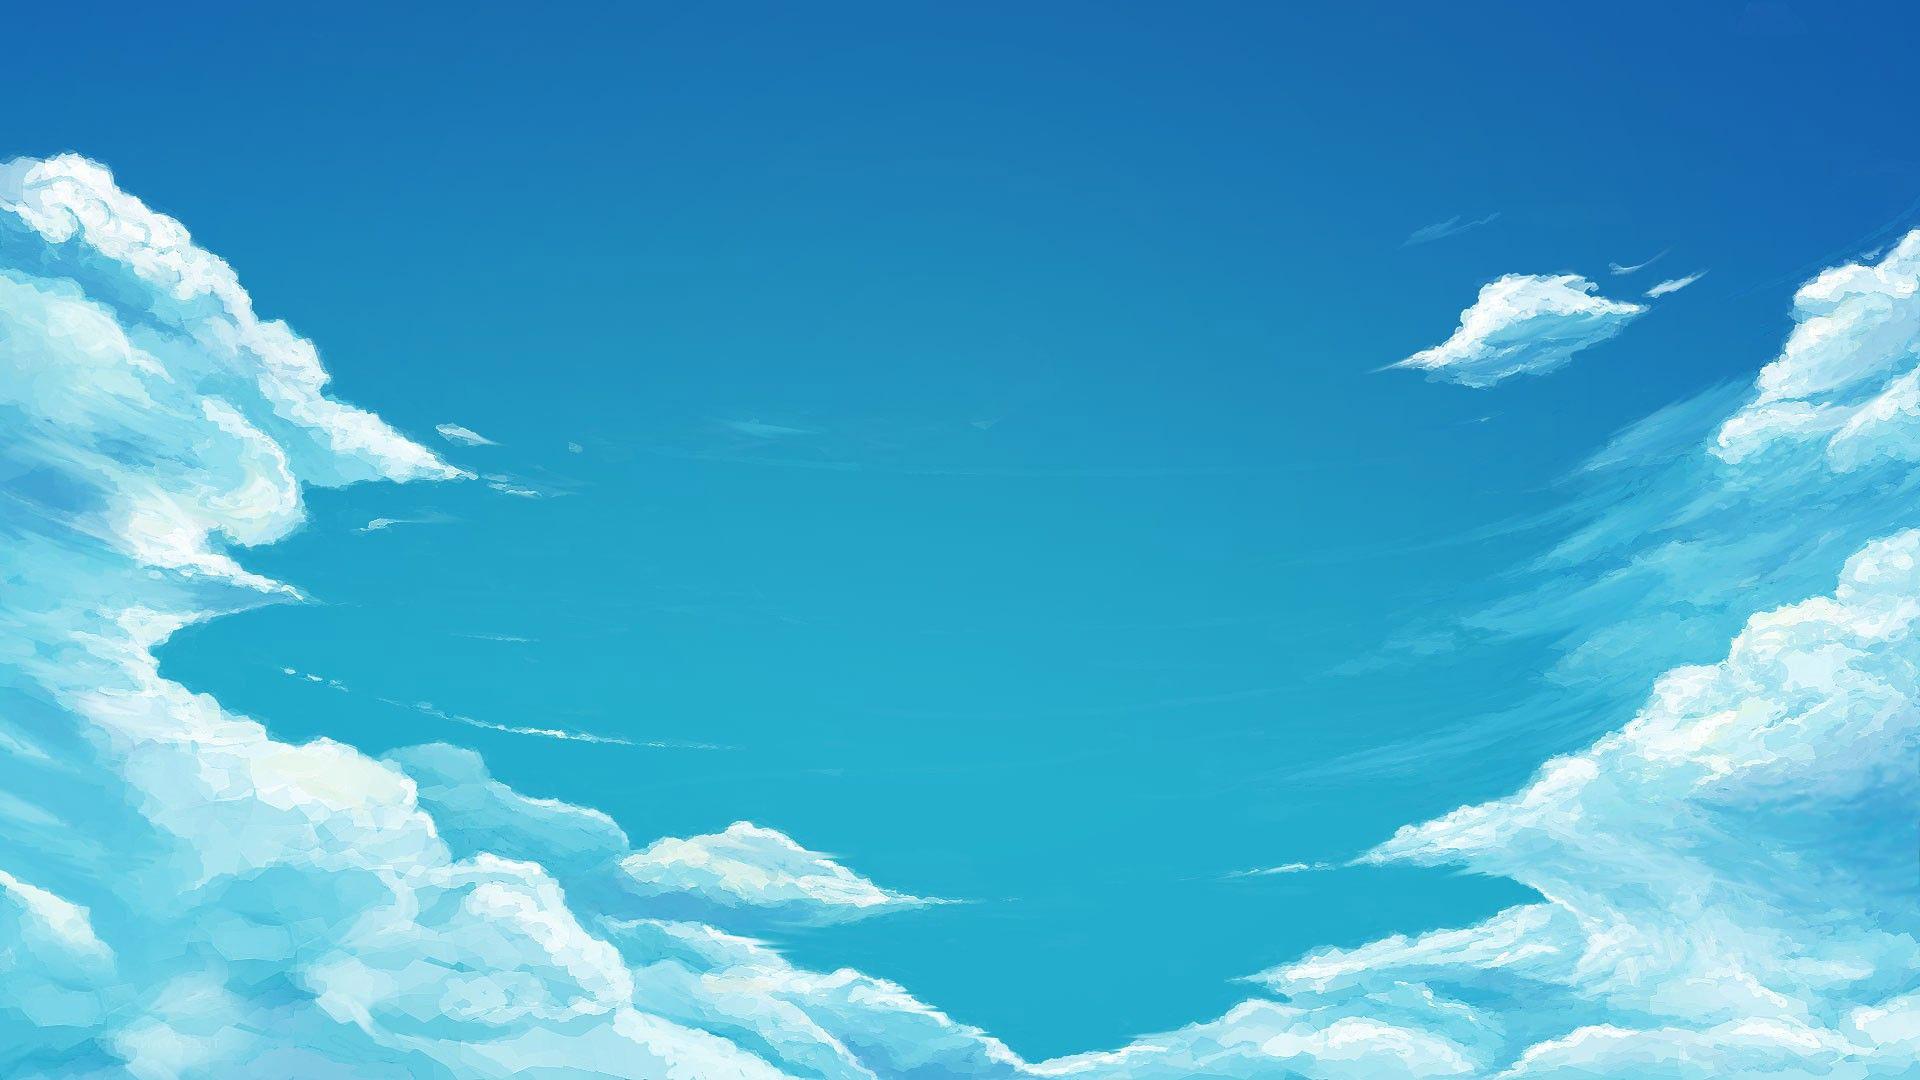 Blue sky wallpaper 14366 1920x1080